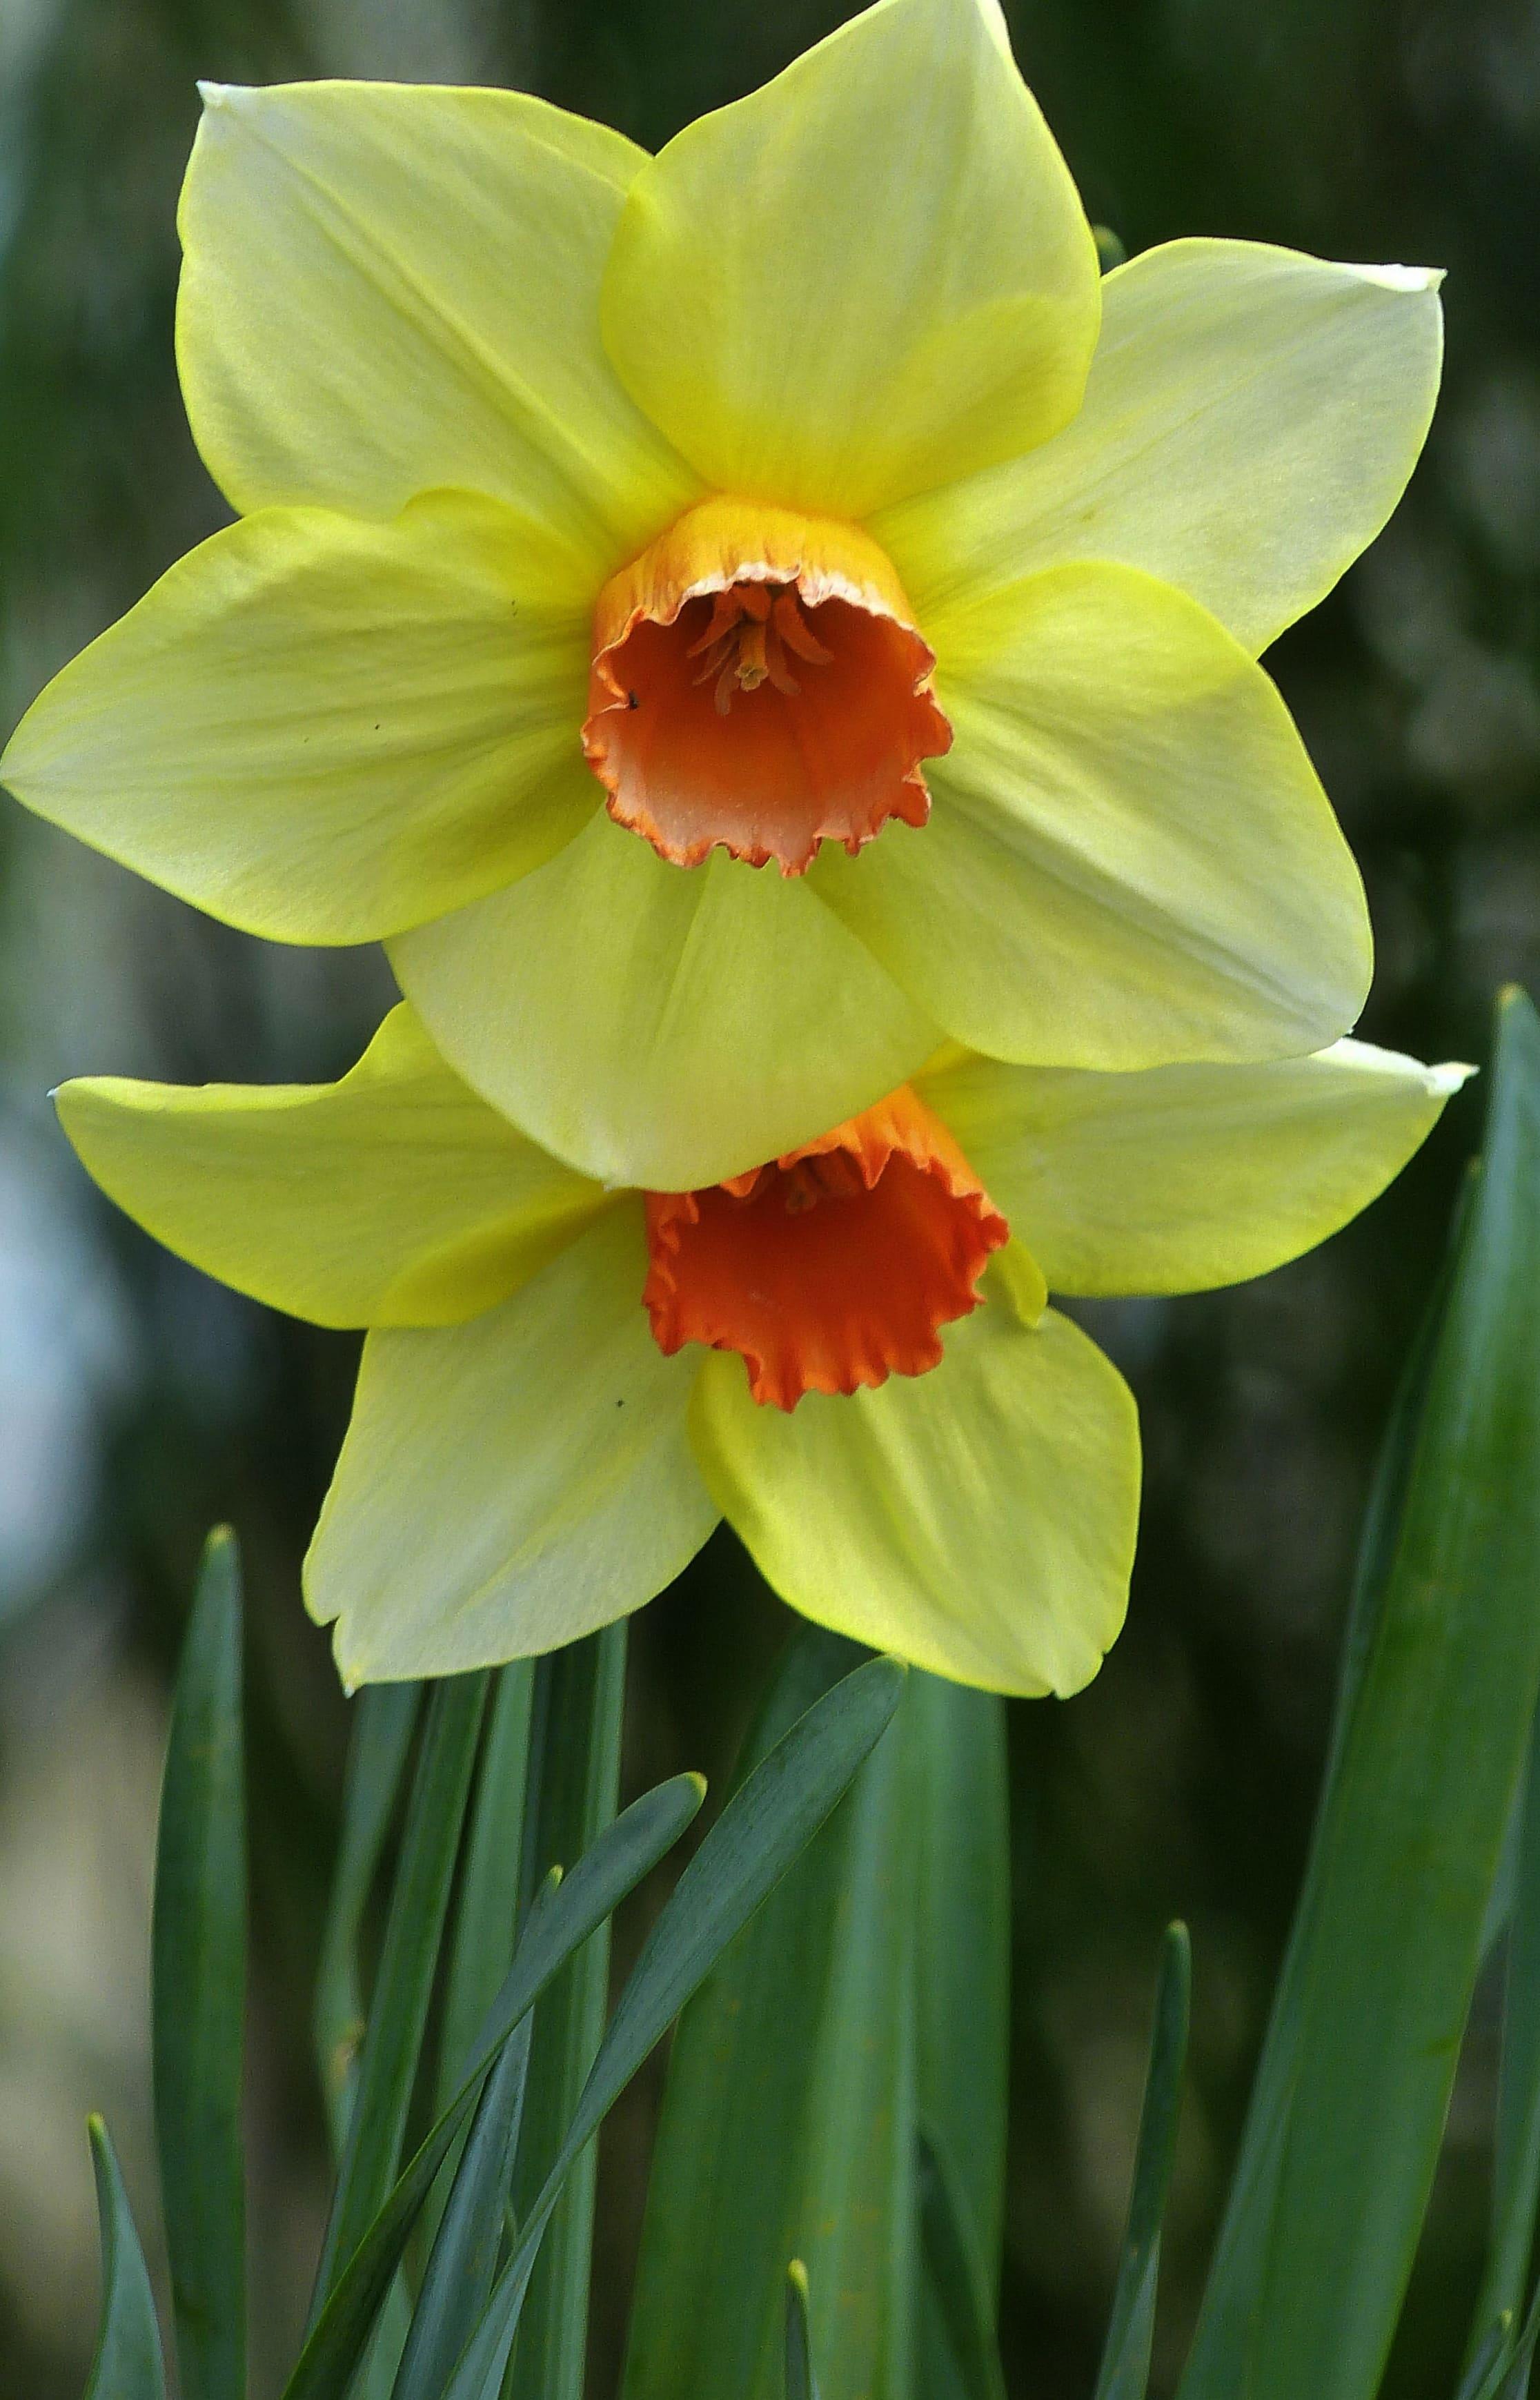 daffodils-photo-4